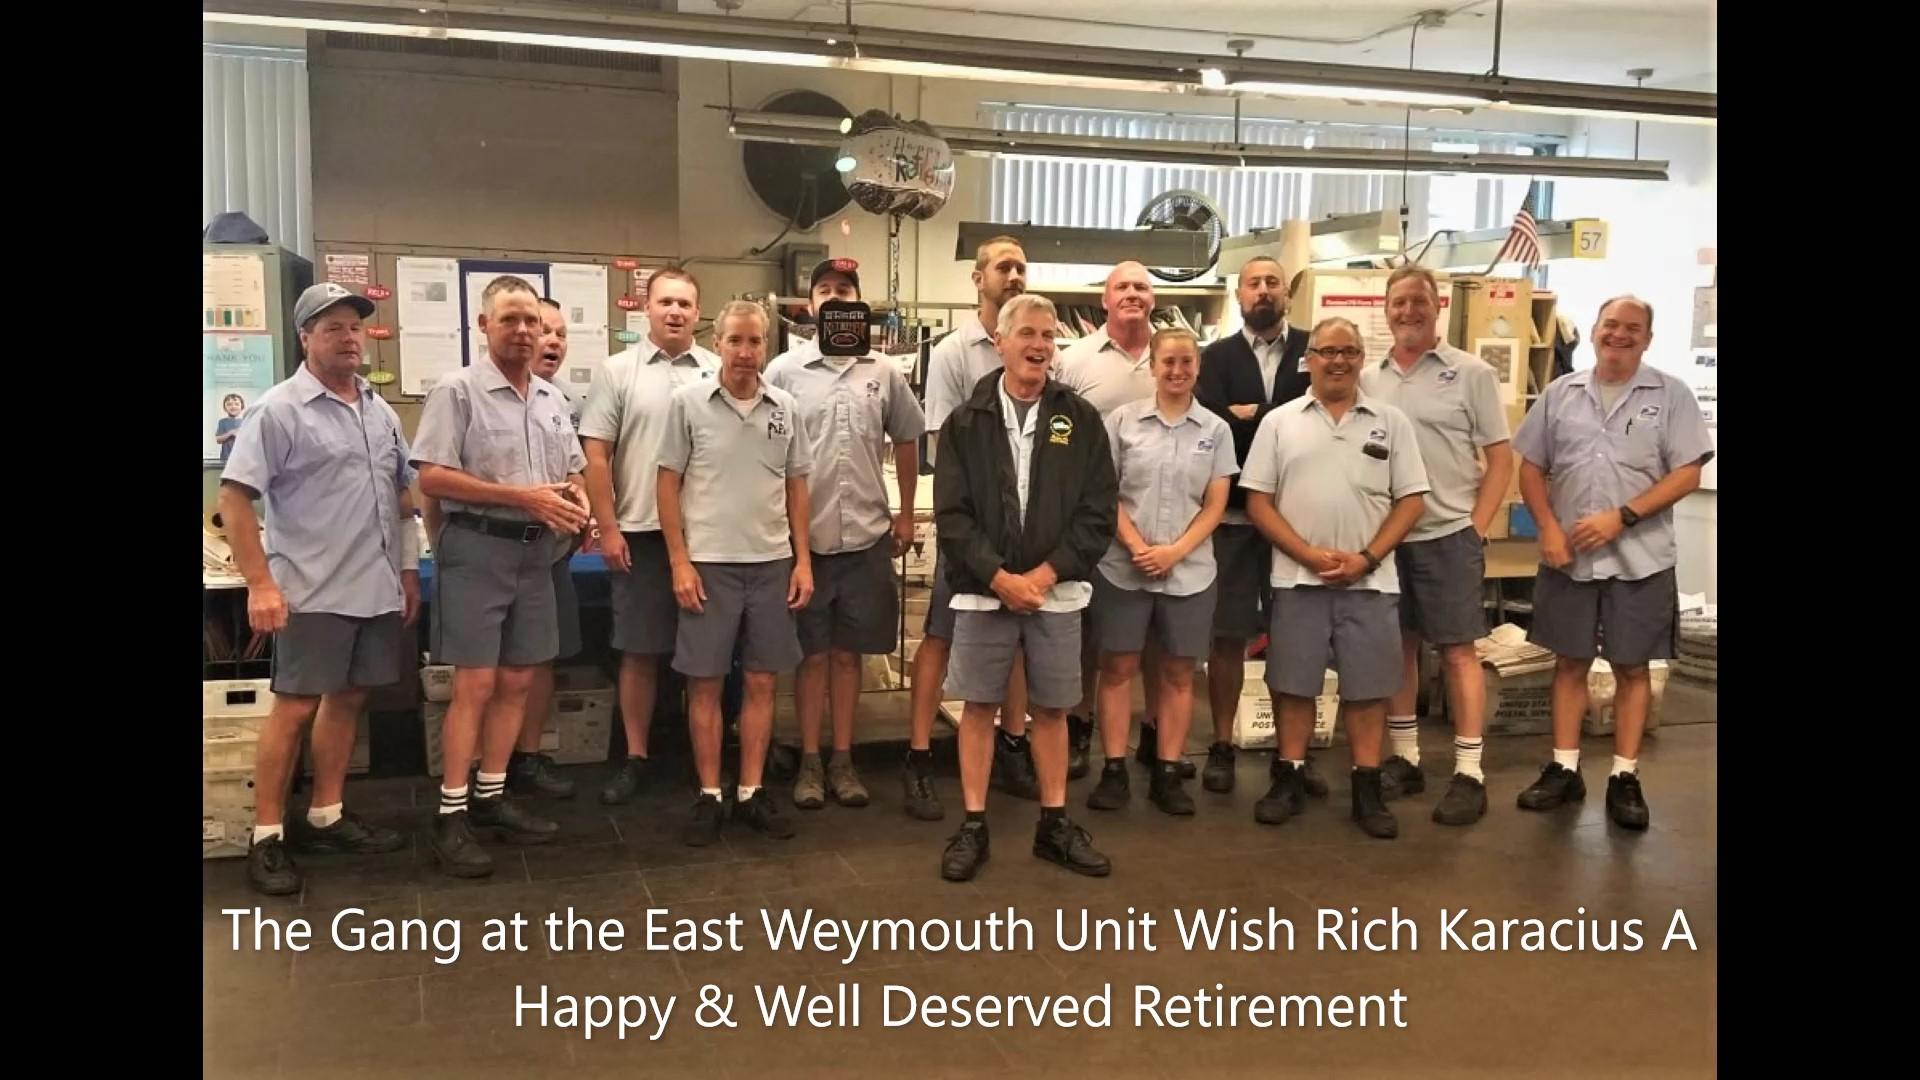 Richard-Karacius-E-Weymouth-Retires-62019-4_Large_Moment